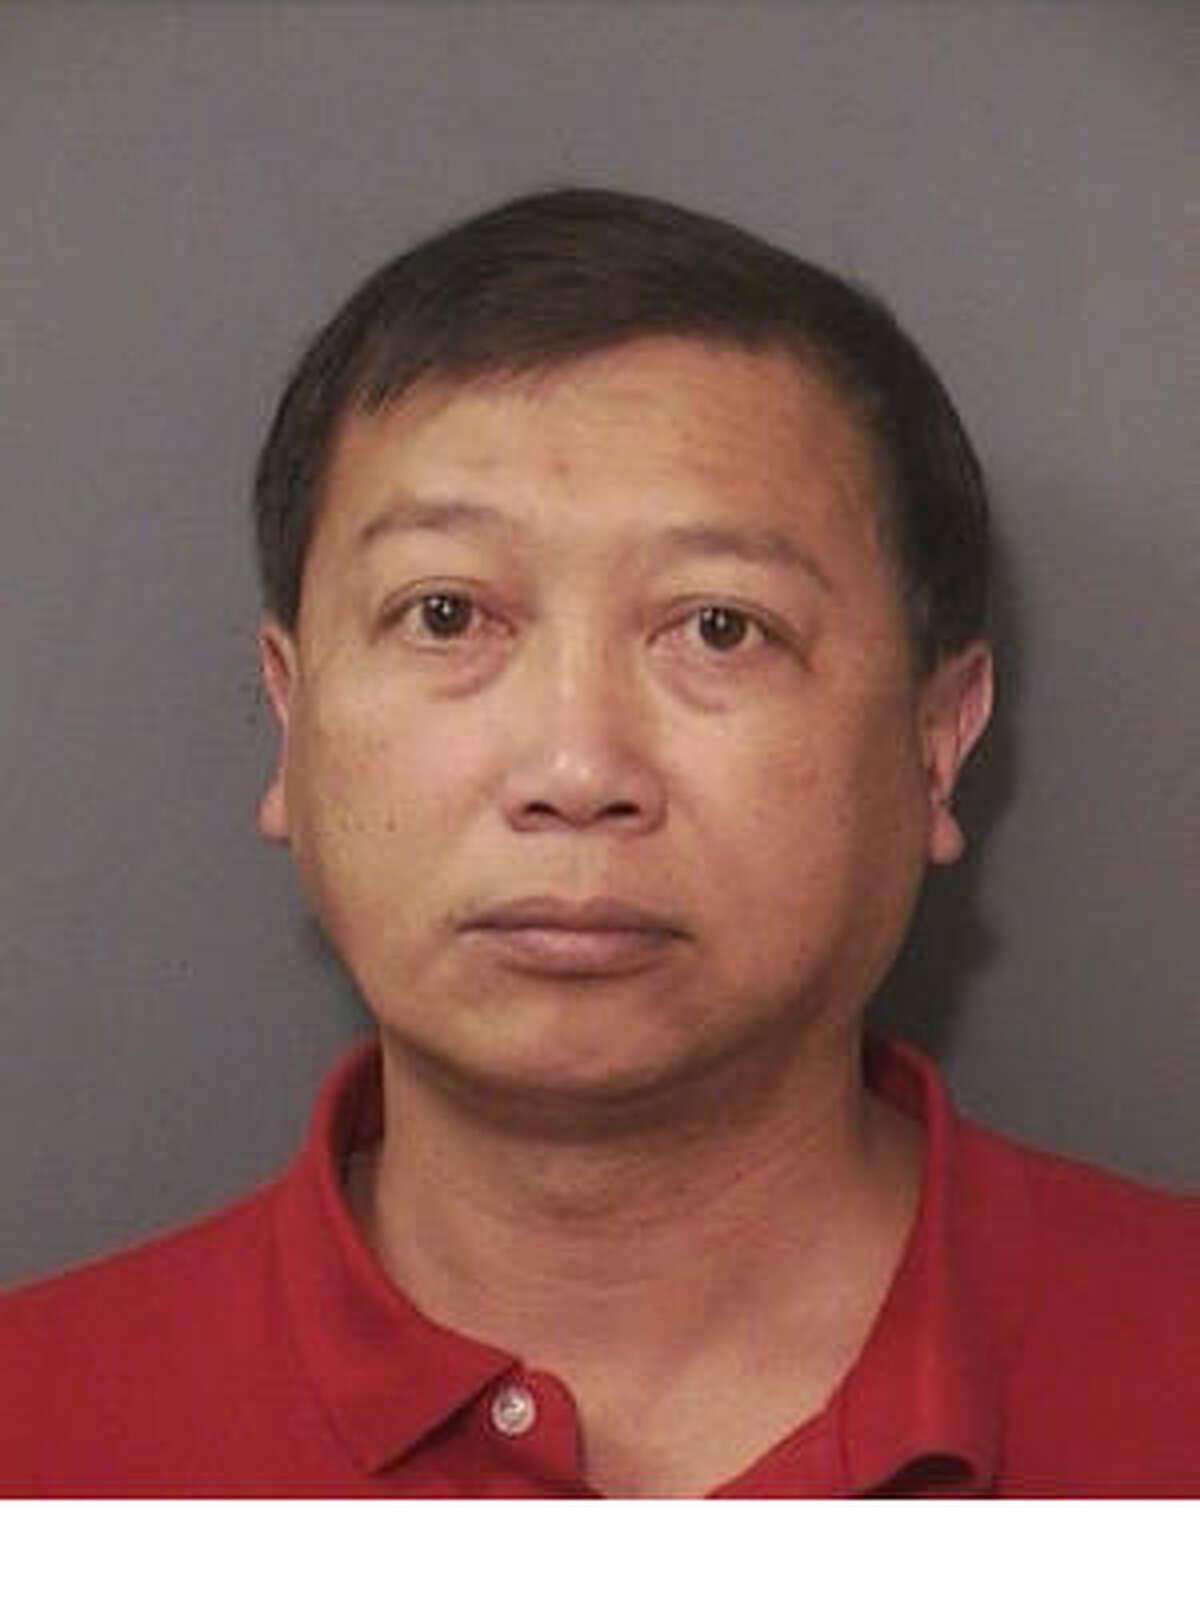 Deputy Wilbert Jue, 52, was fired from his job in Precinct 1 Constable Jack Abercia's office.